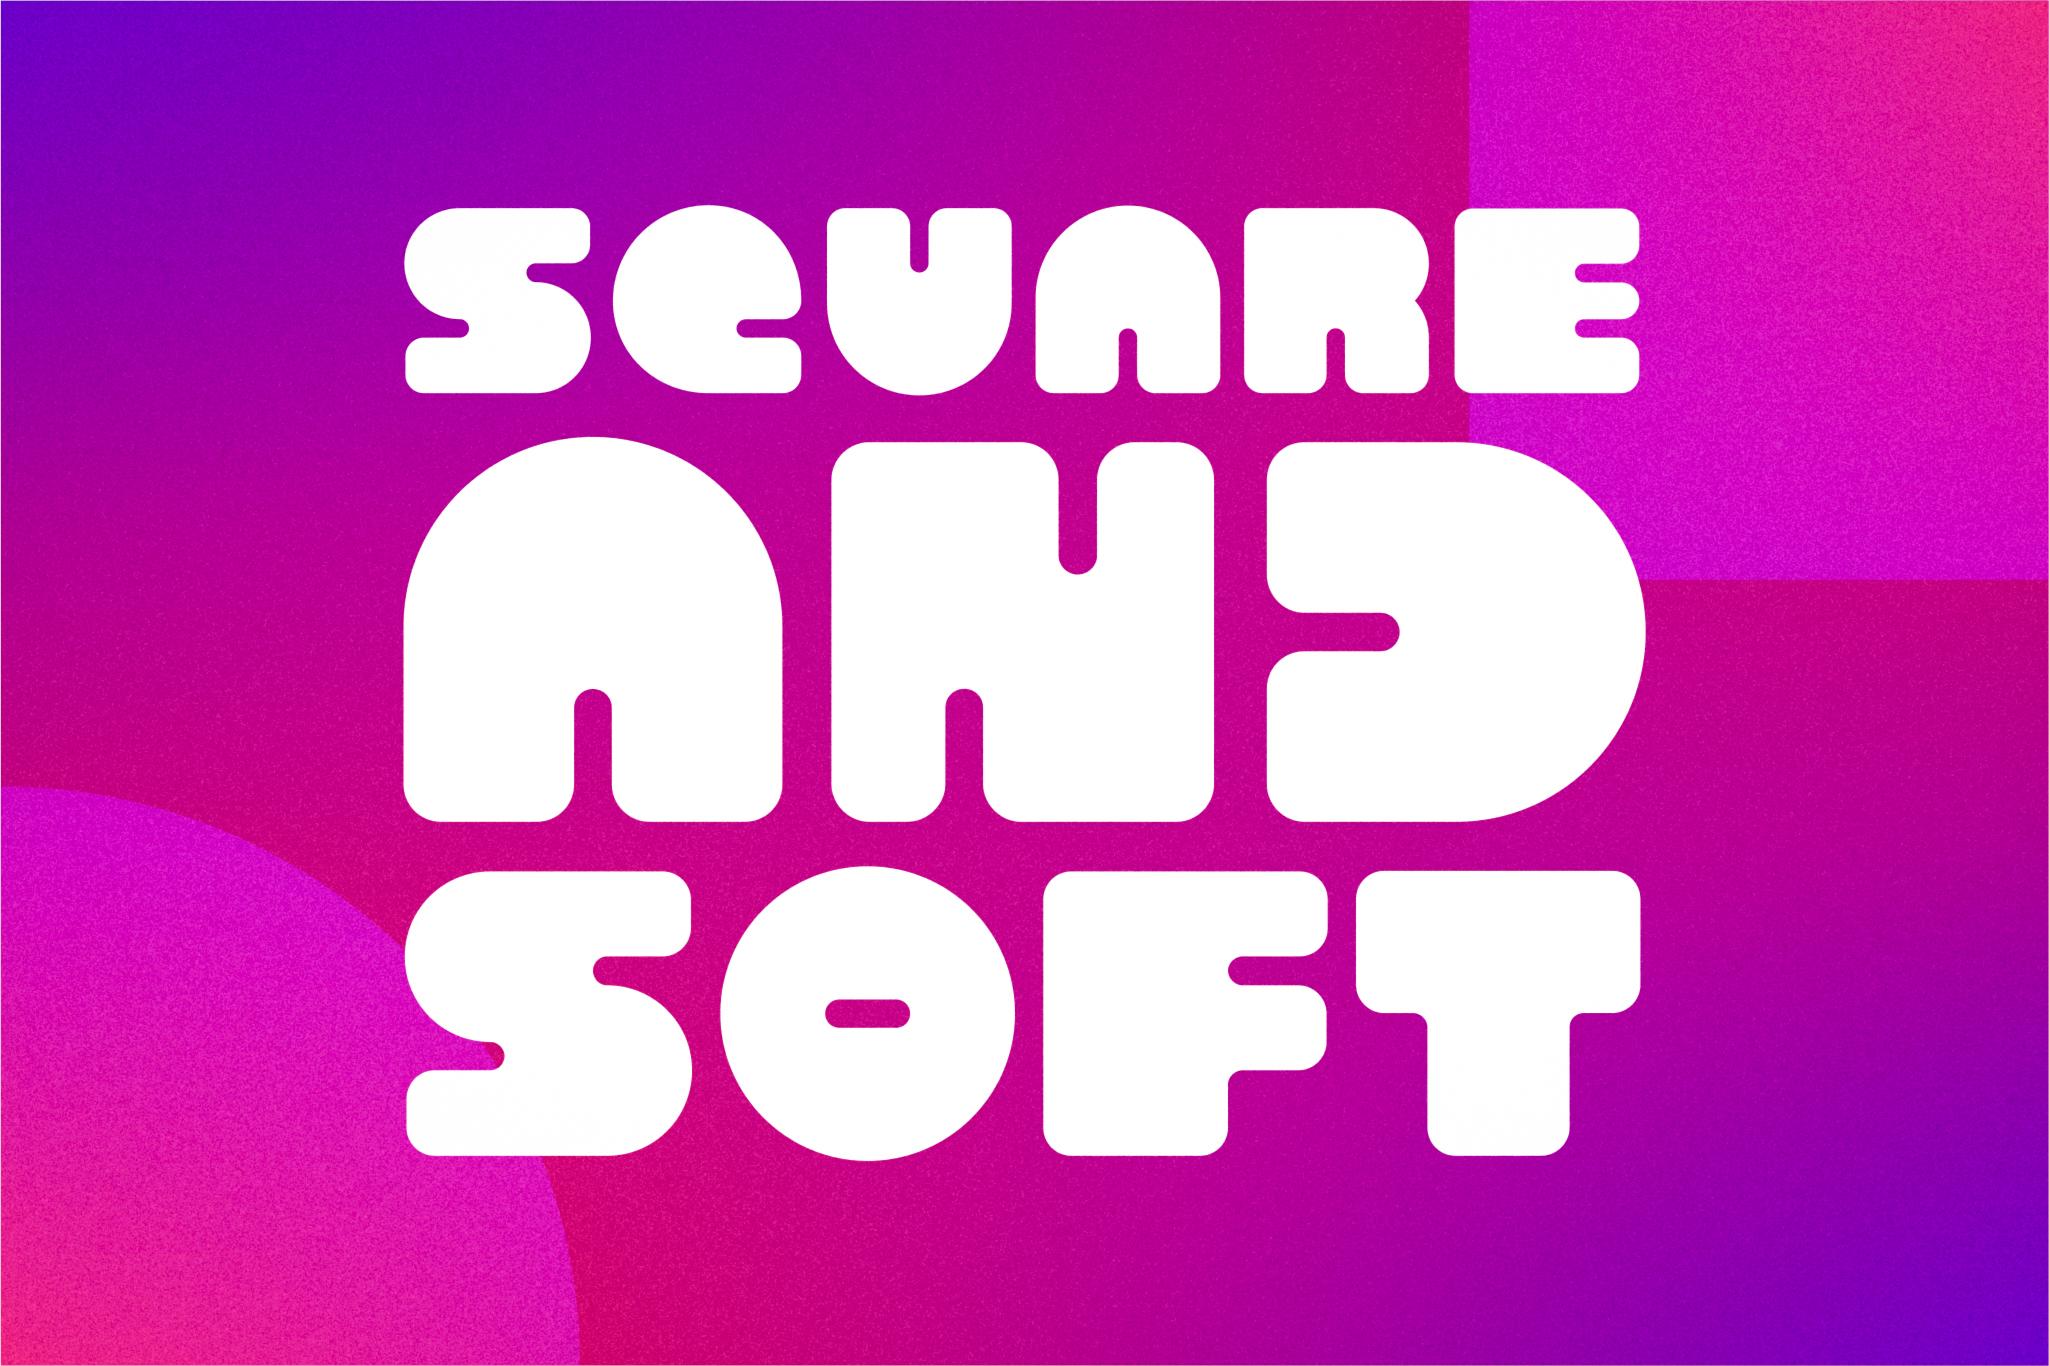 SQUAROUND S example image 9